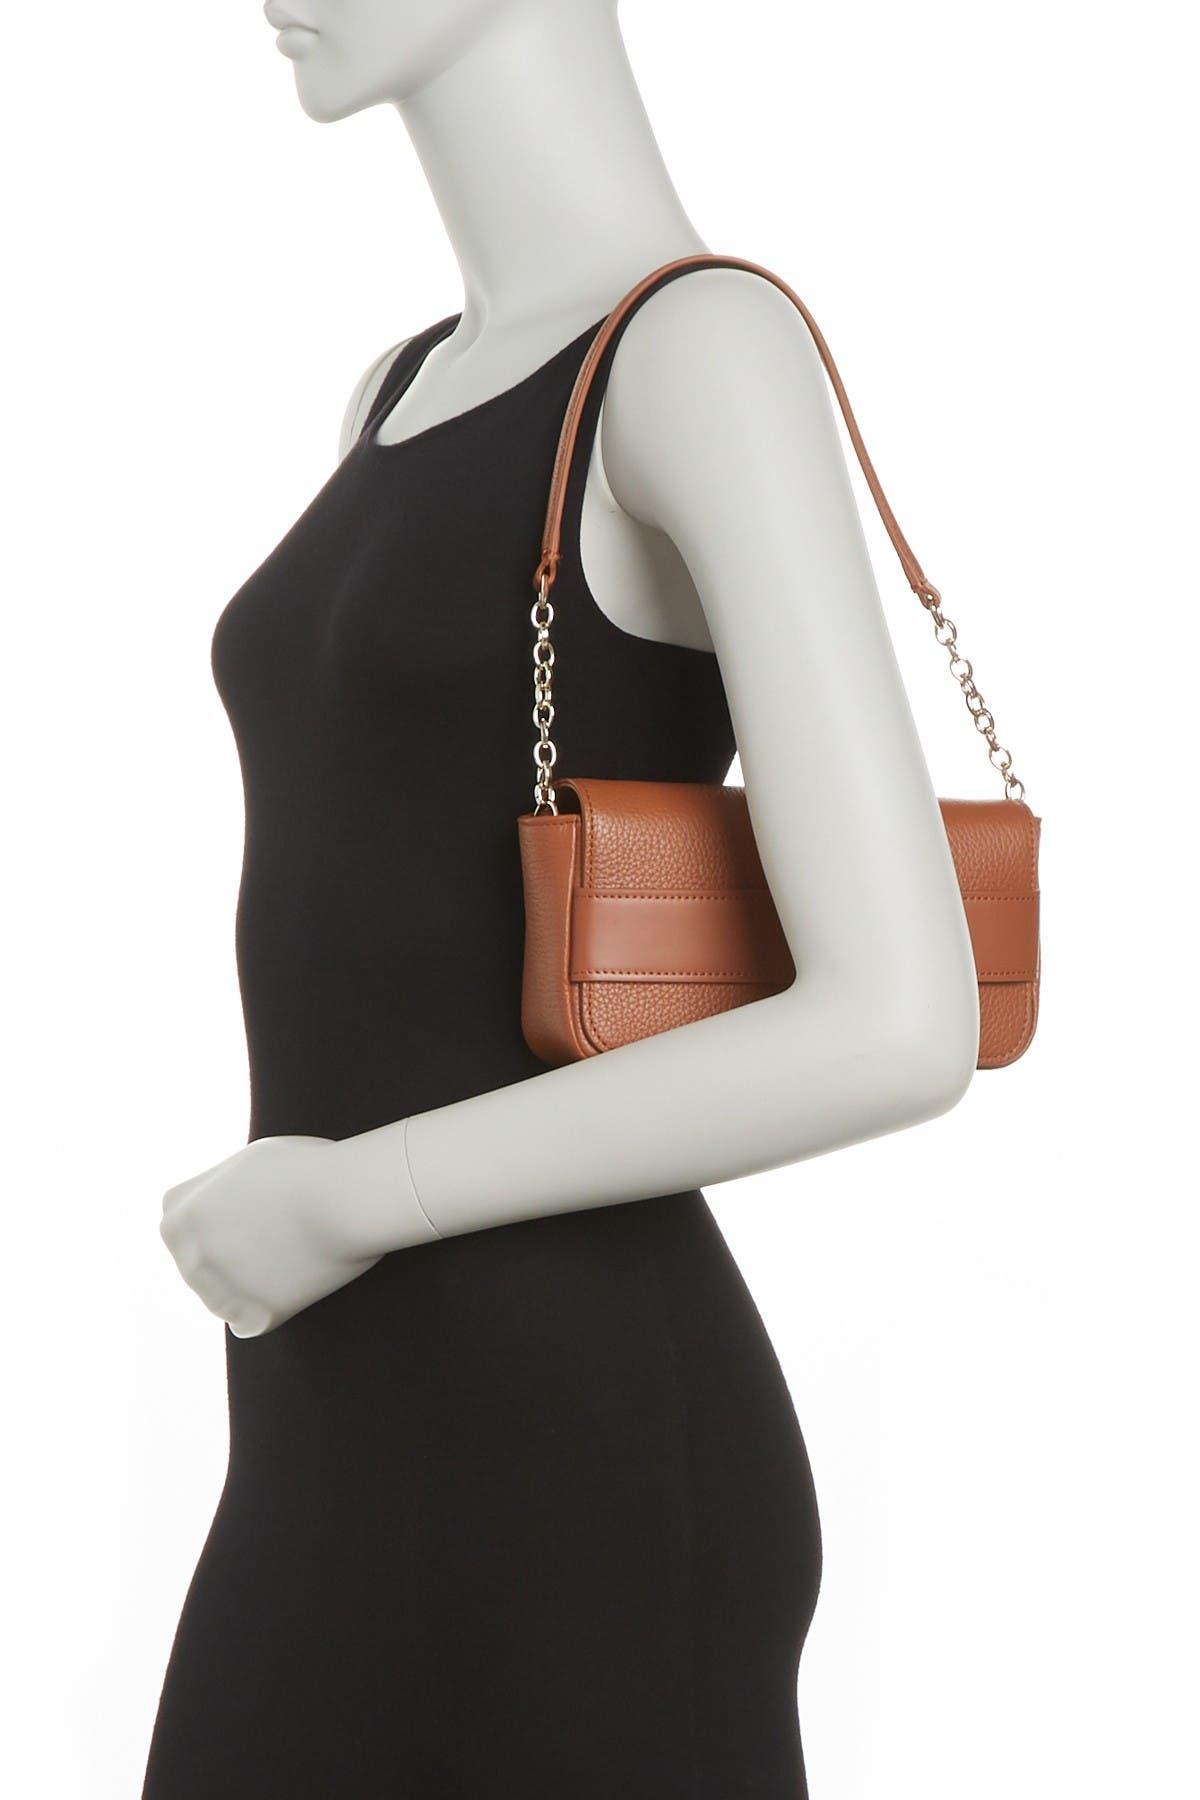 Image of Lipault Leather Chain Strap Shoulder Bag